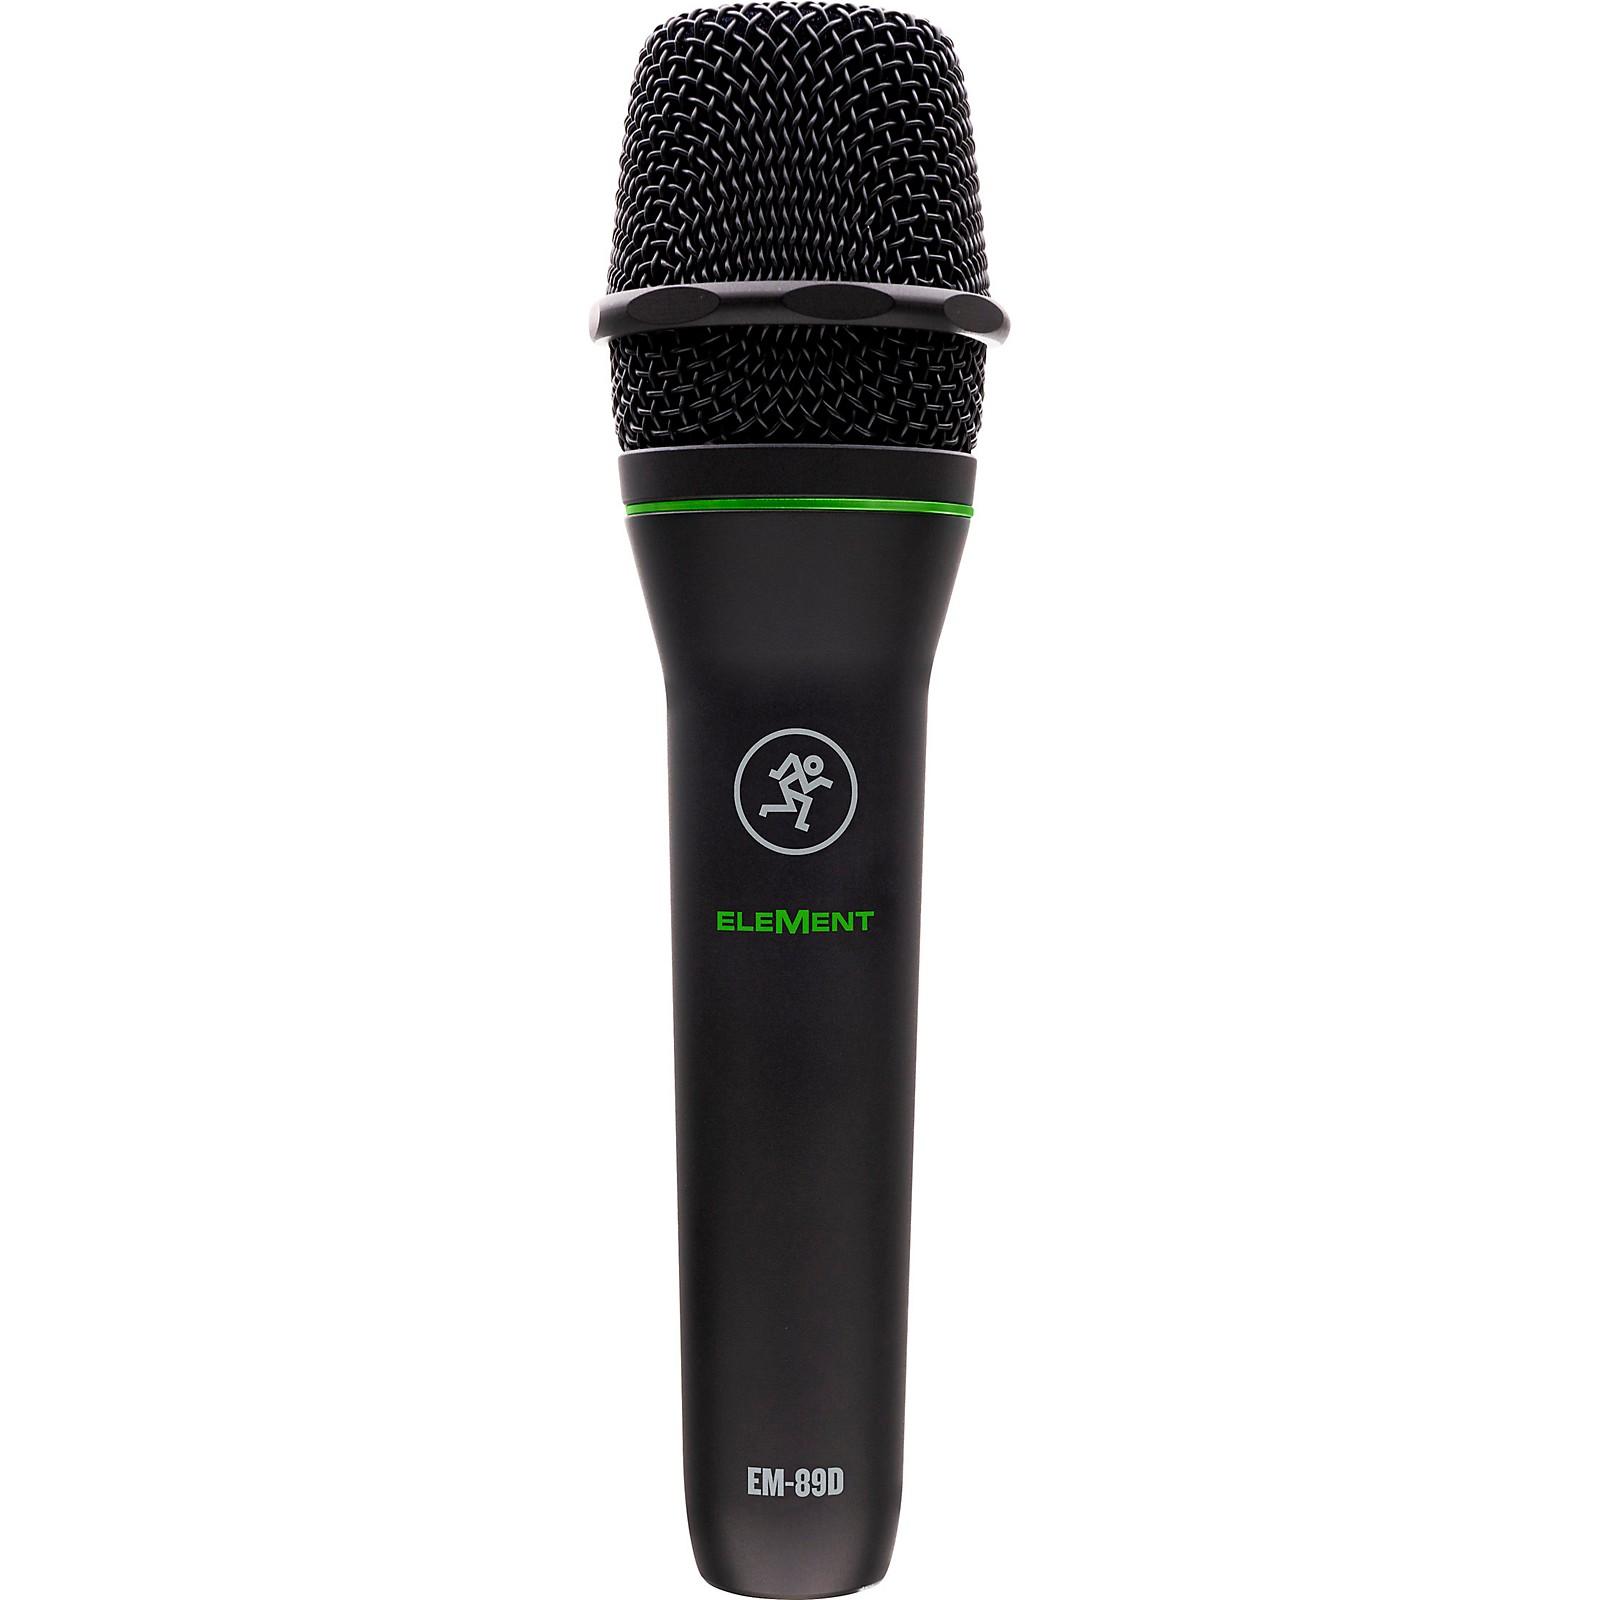 Mackie Element Series EM89D Dynamic Vocal Microphone